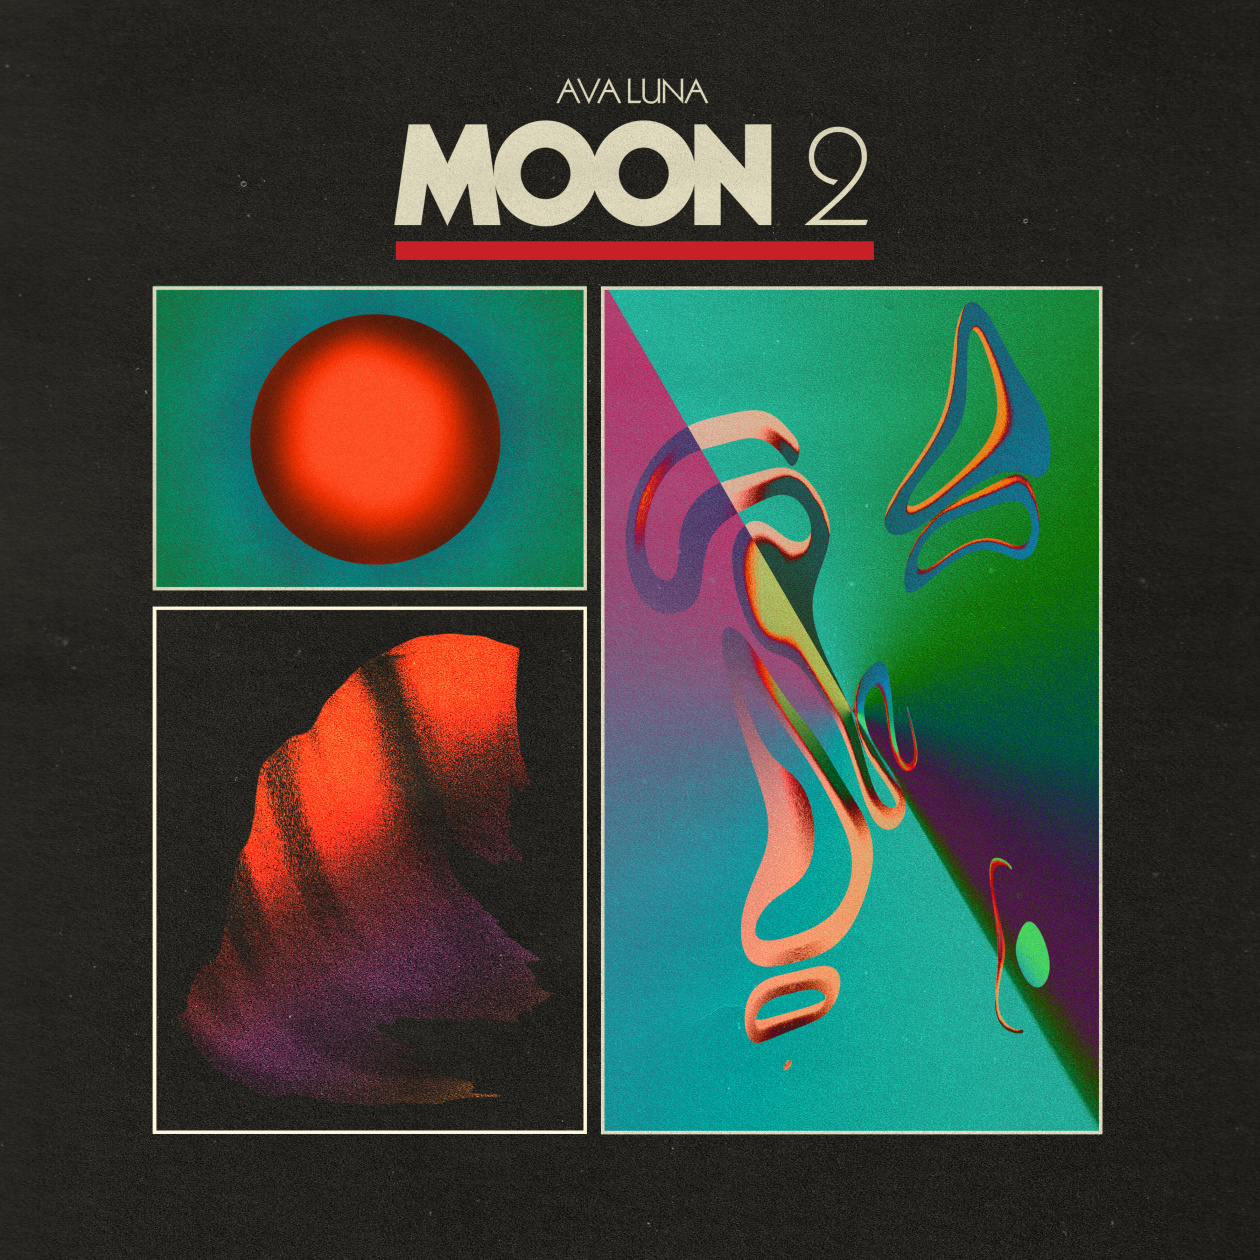 ava-luna-deli-run-song-moon-2-album.jpg